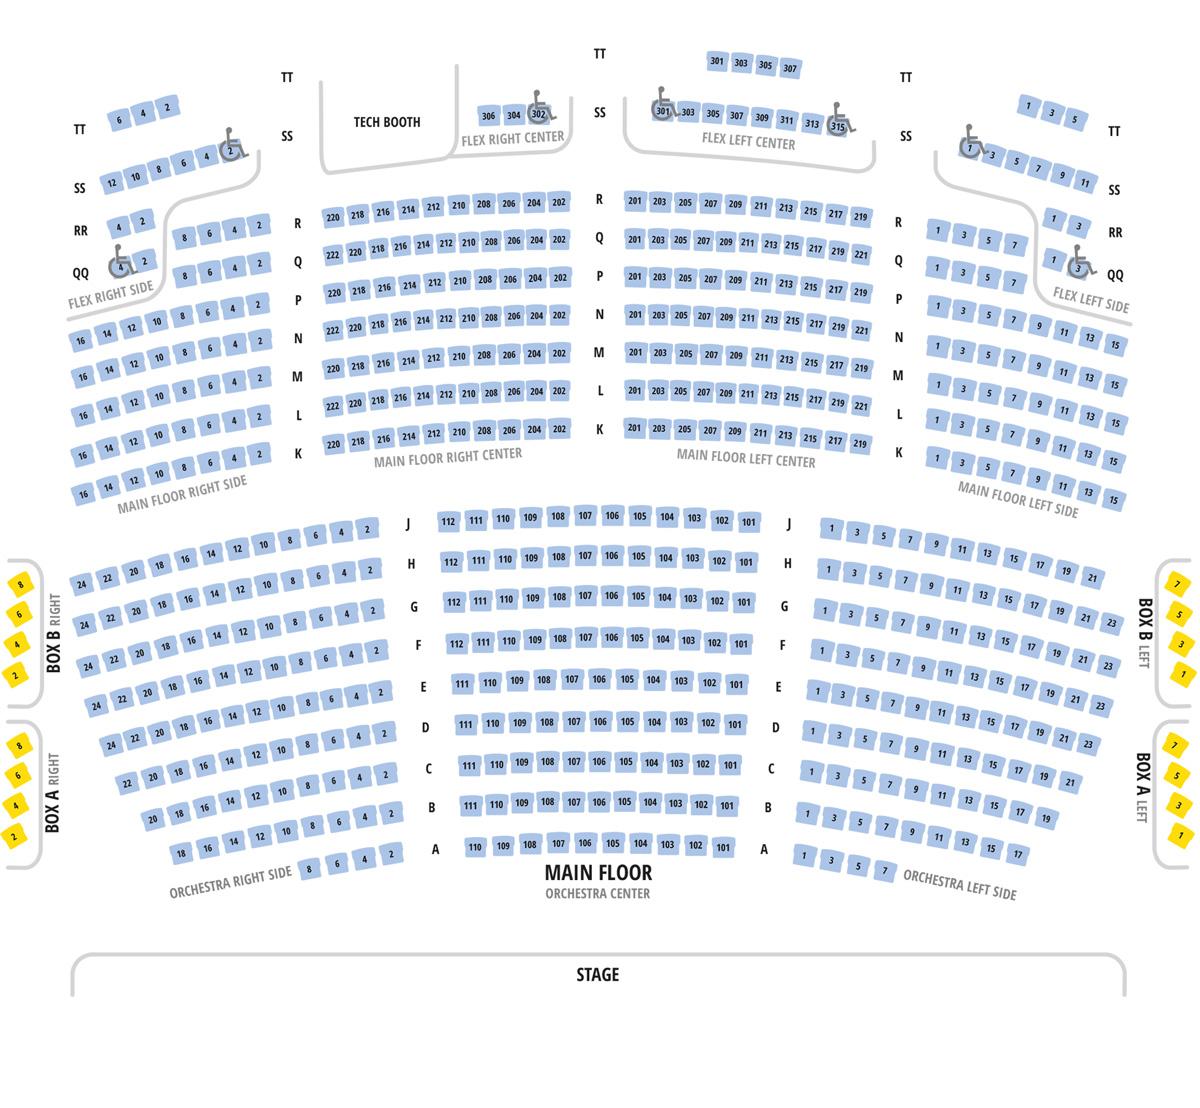 Ccc Seating Chart  U2013 Manitowoc Symphony Orchestra